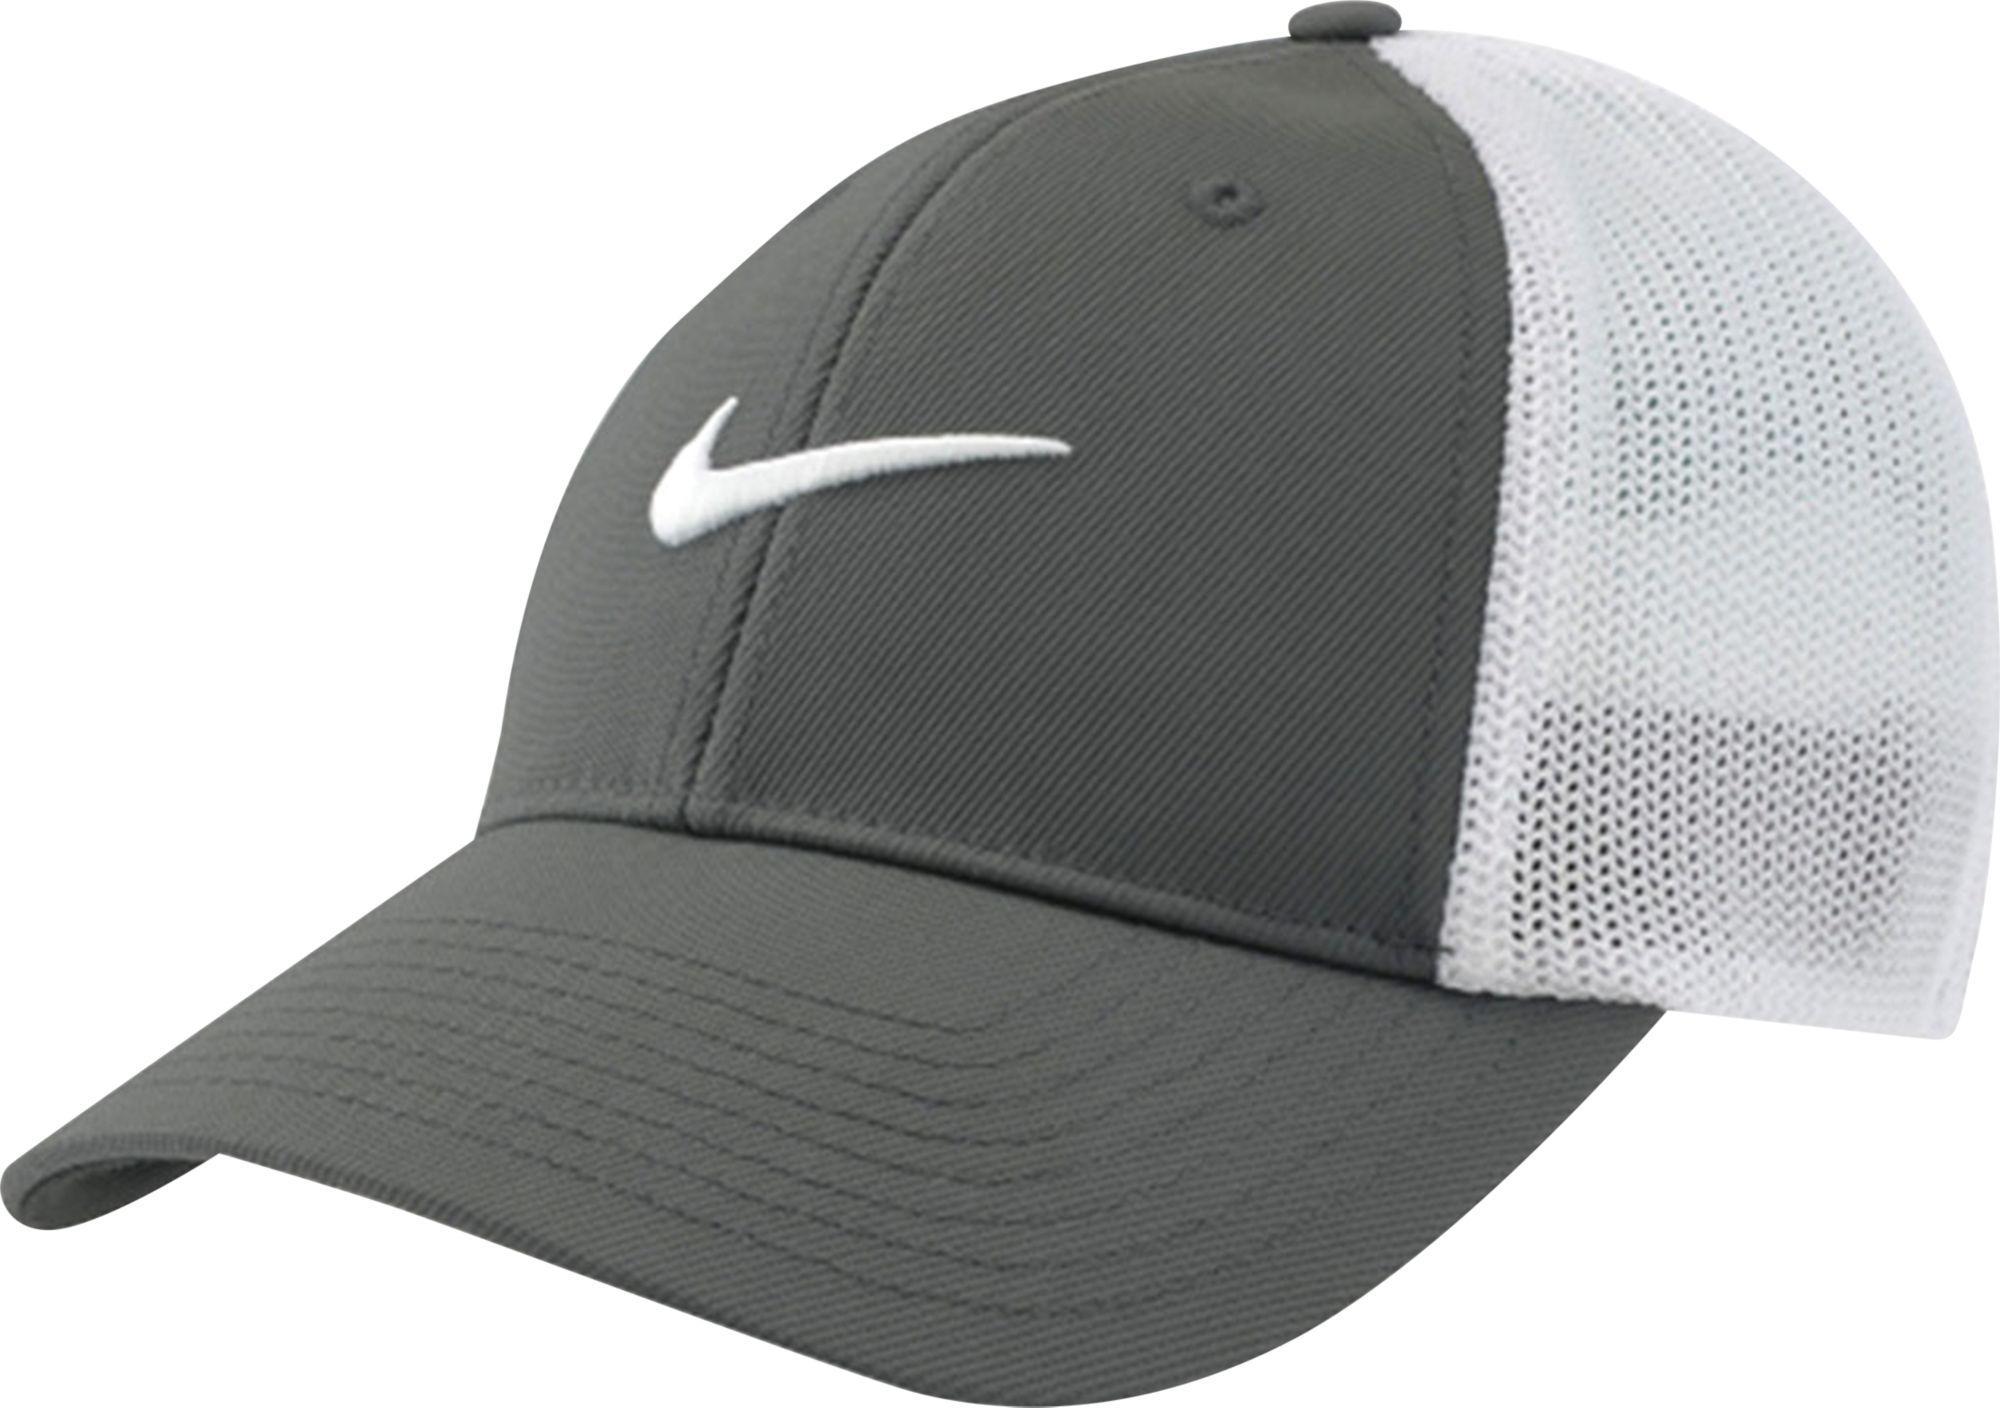 c3a8f9a3d27 Lyst - Nike Flex Fit Golf Hat in Gray for Men